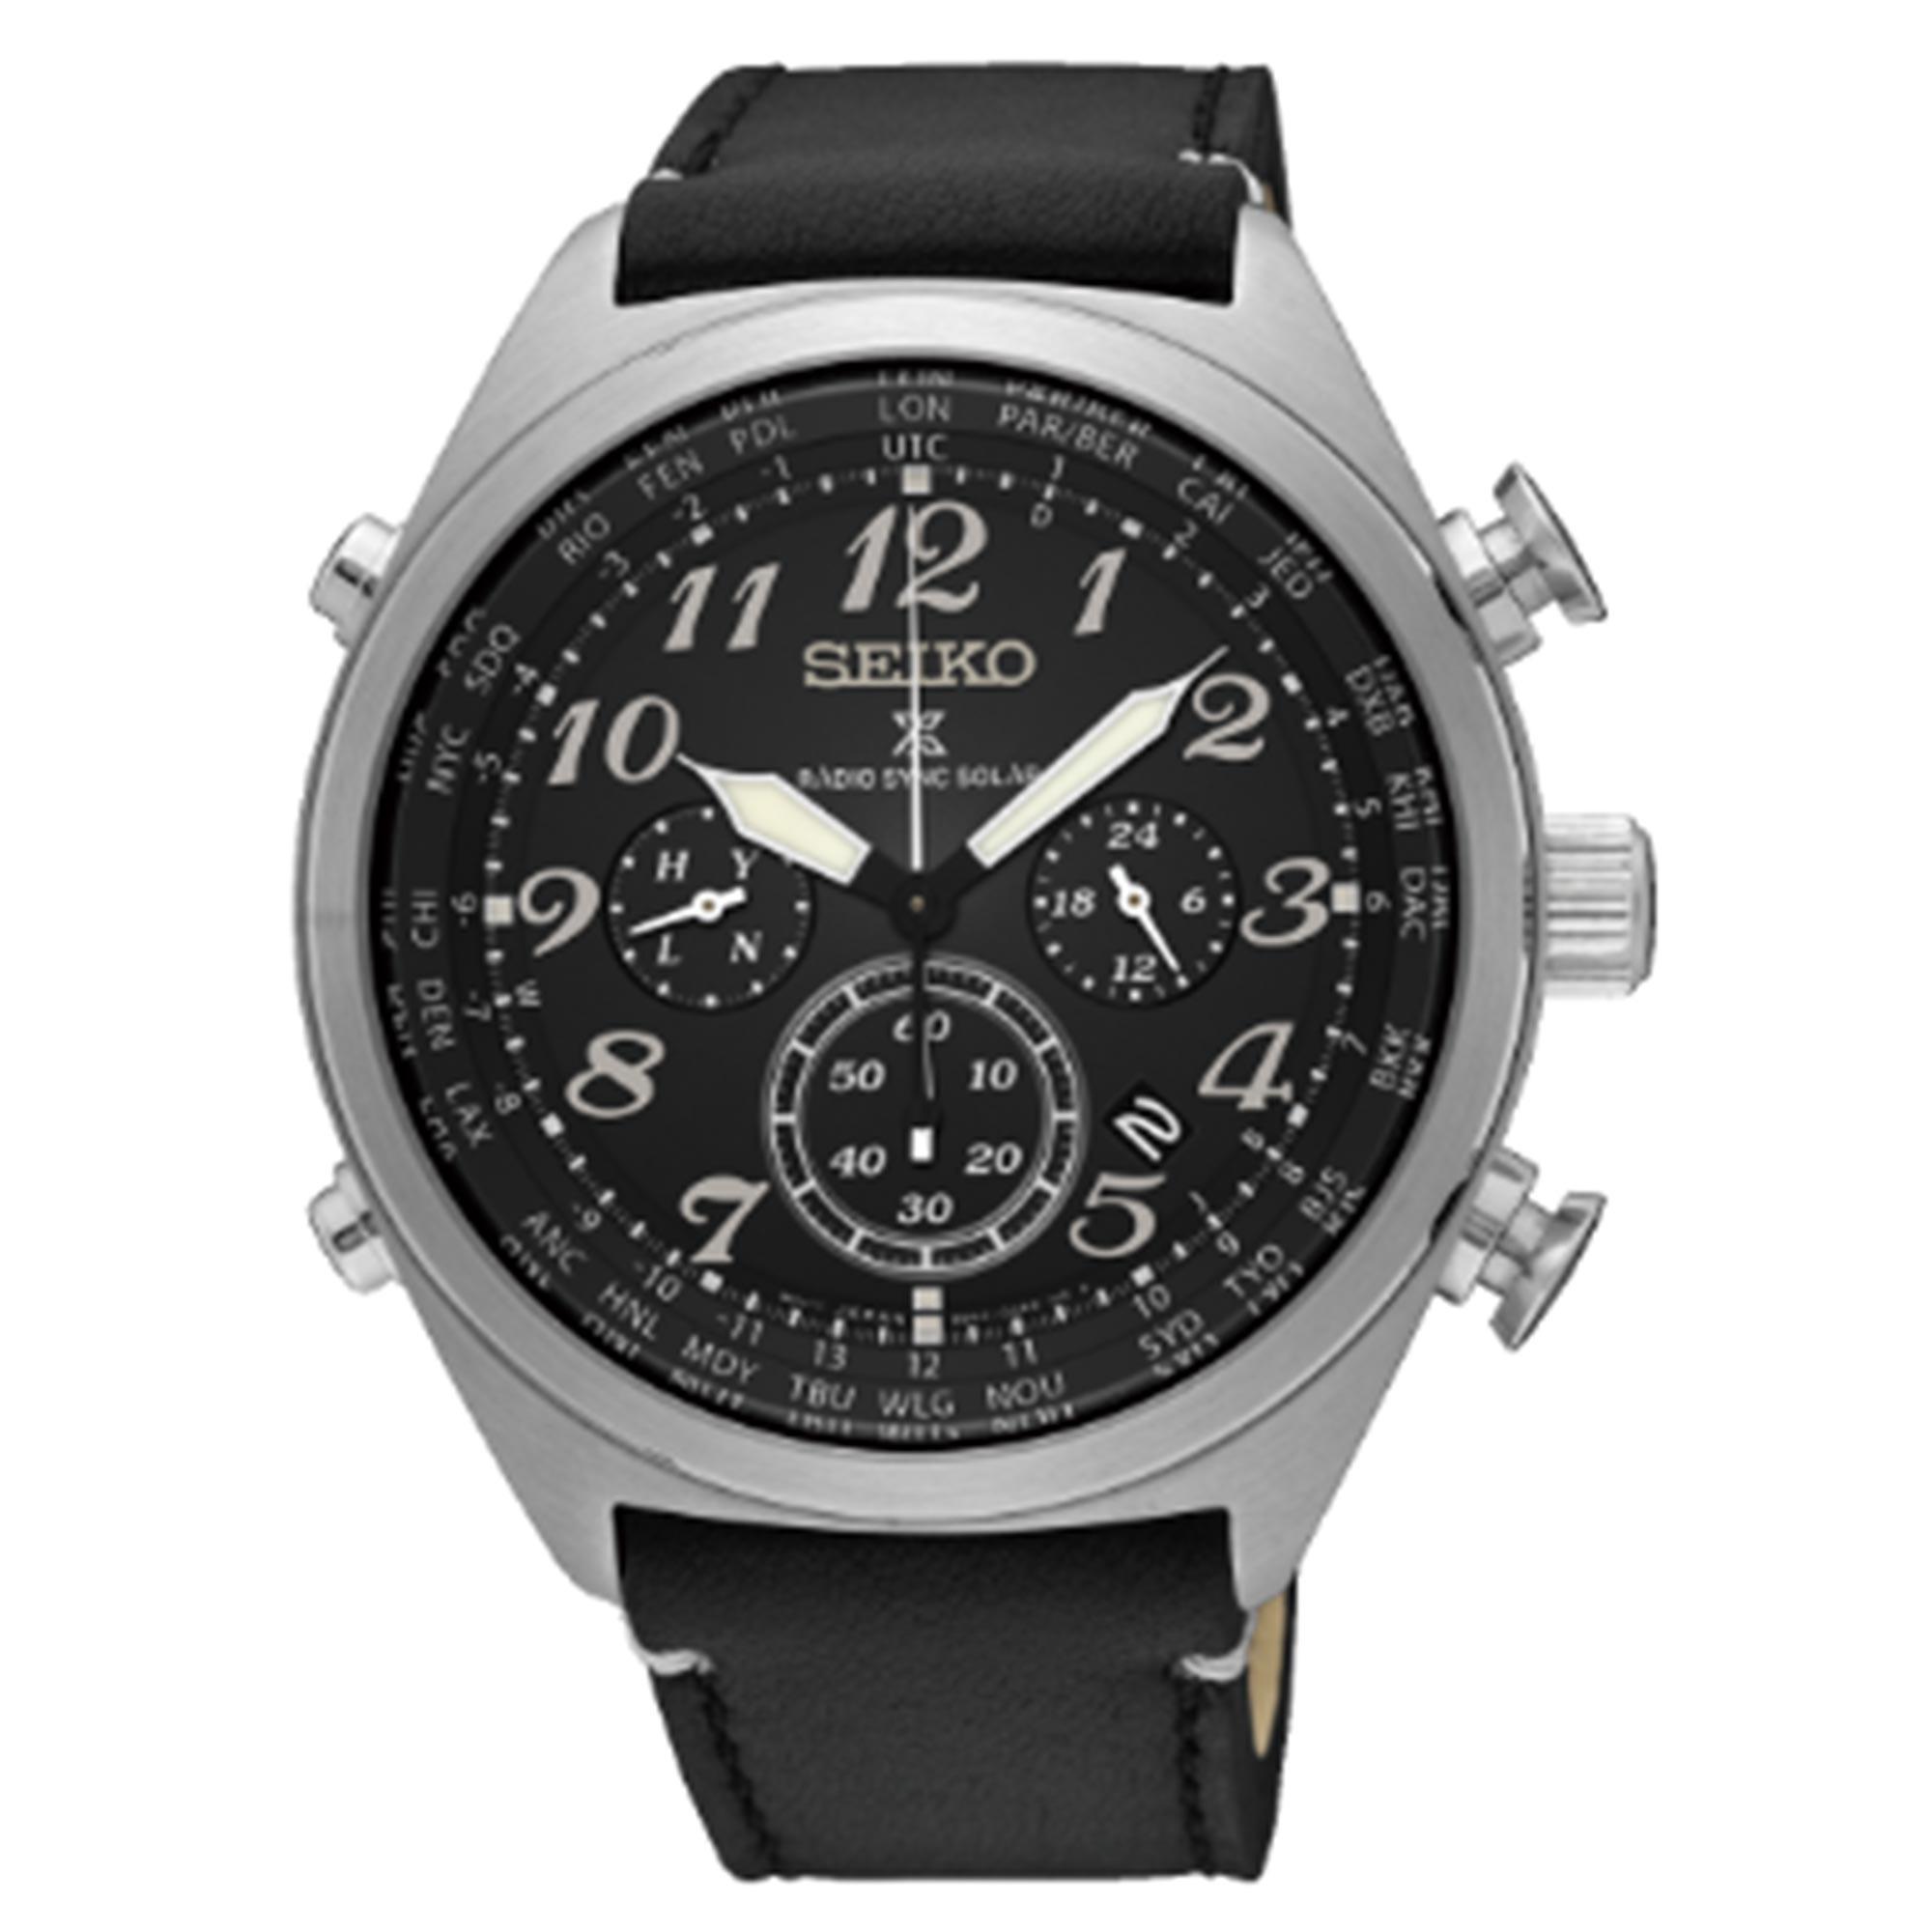 Seiko Prospex Radio Sync Solar Black Dial Leather Strap Chronograph Men's Watch SSG013P1 RRP £449